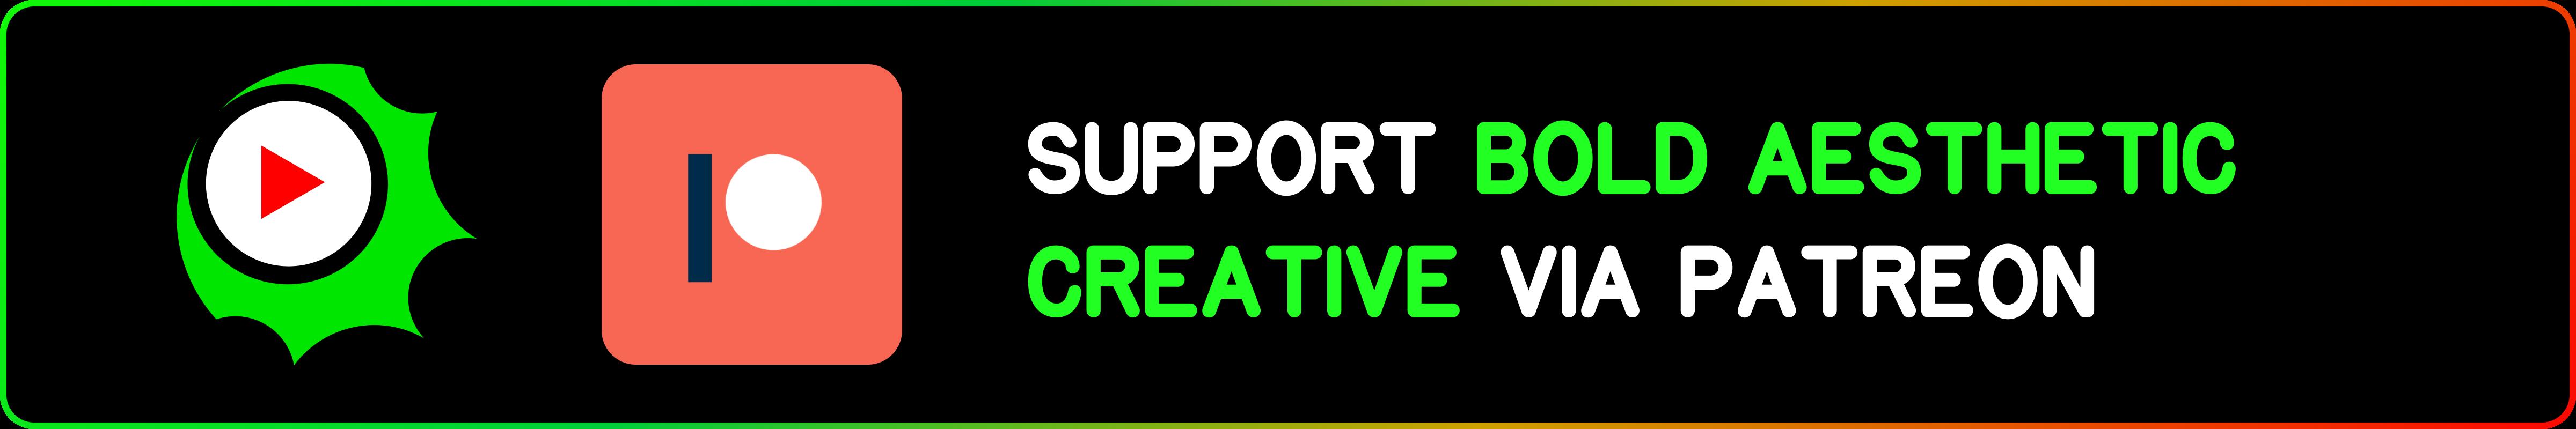 Bold Aesthetic Creative Patreon